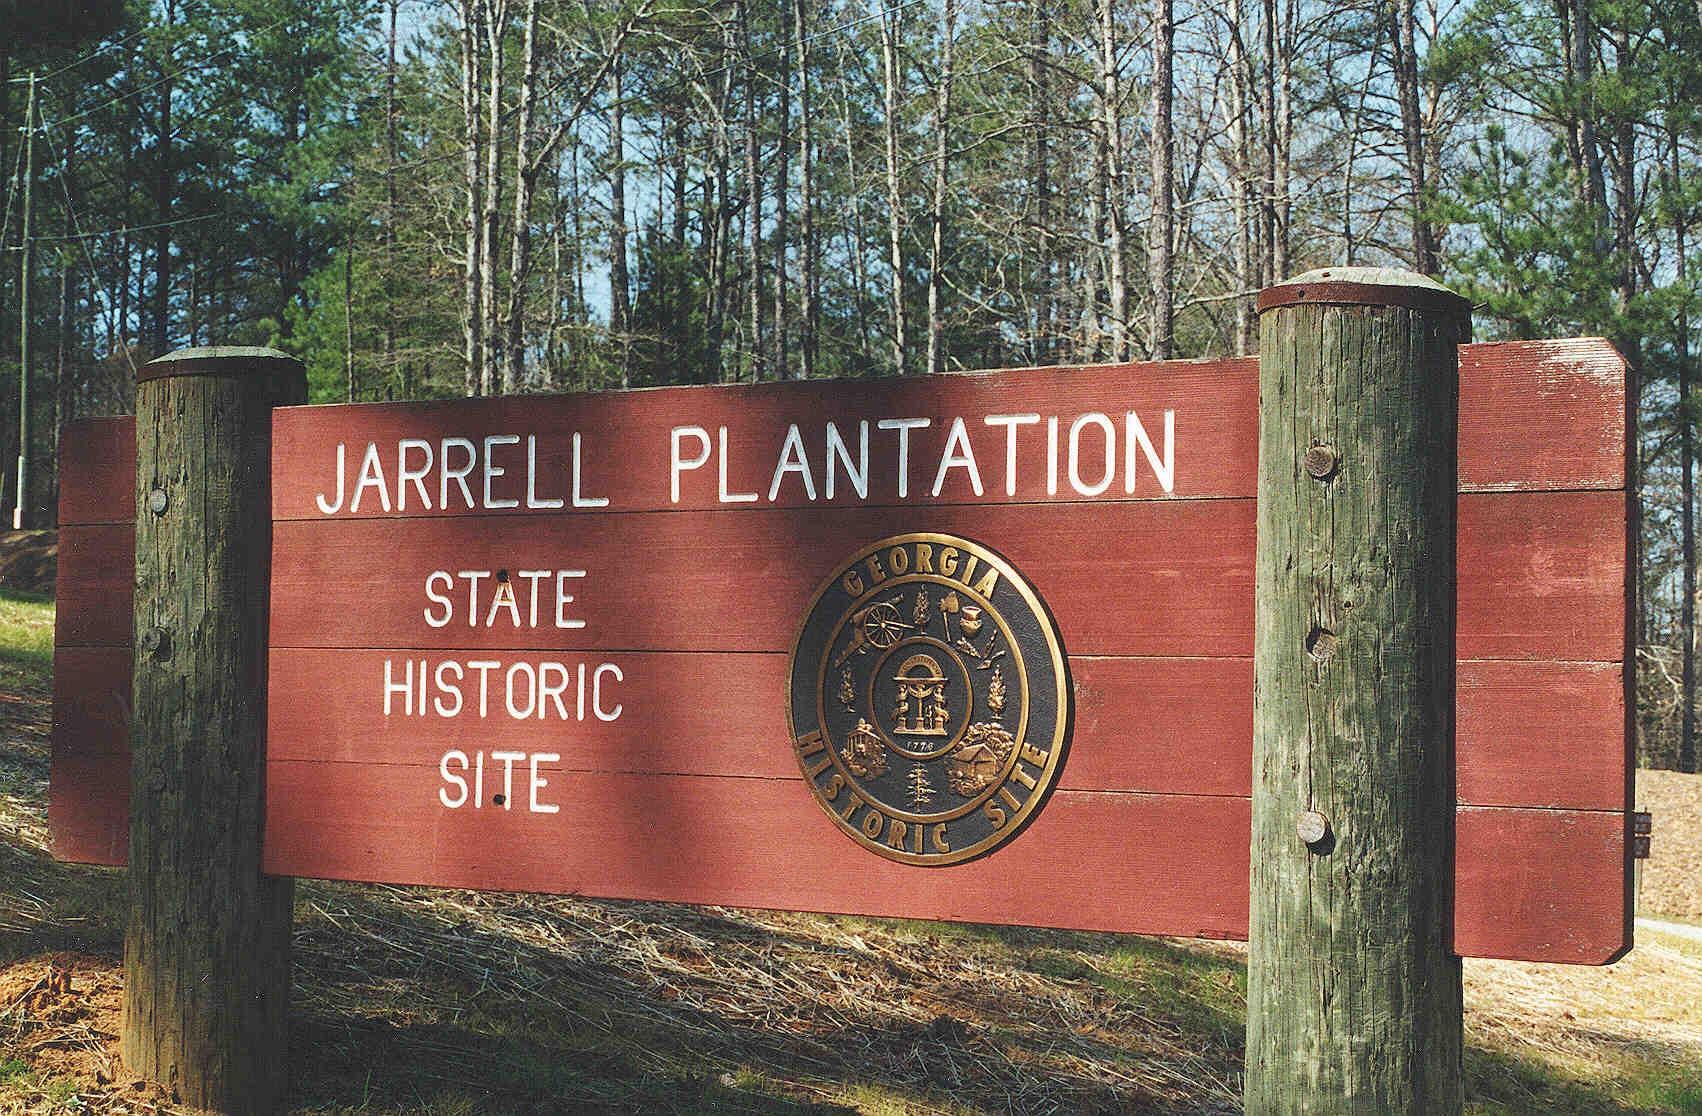 Jarrell-plantation